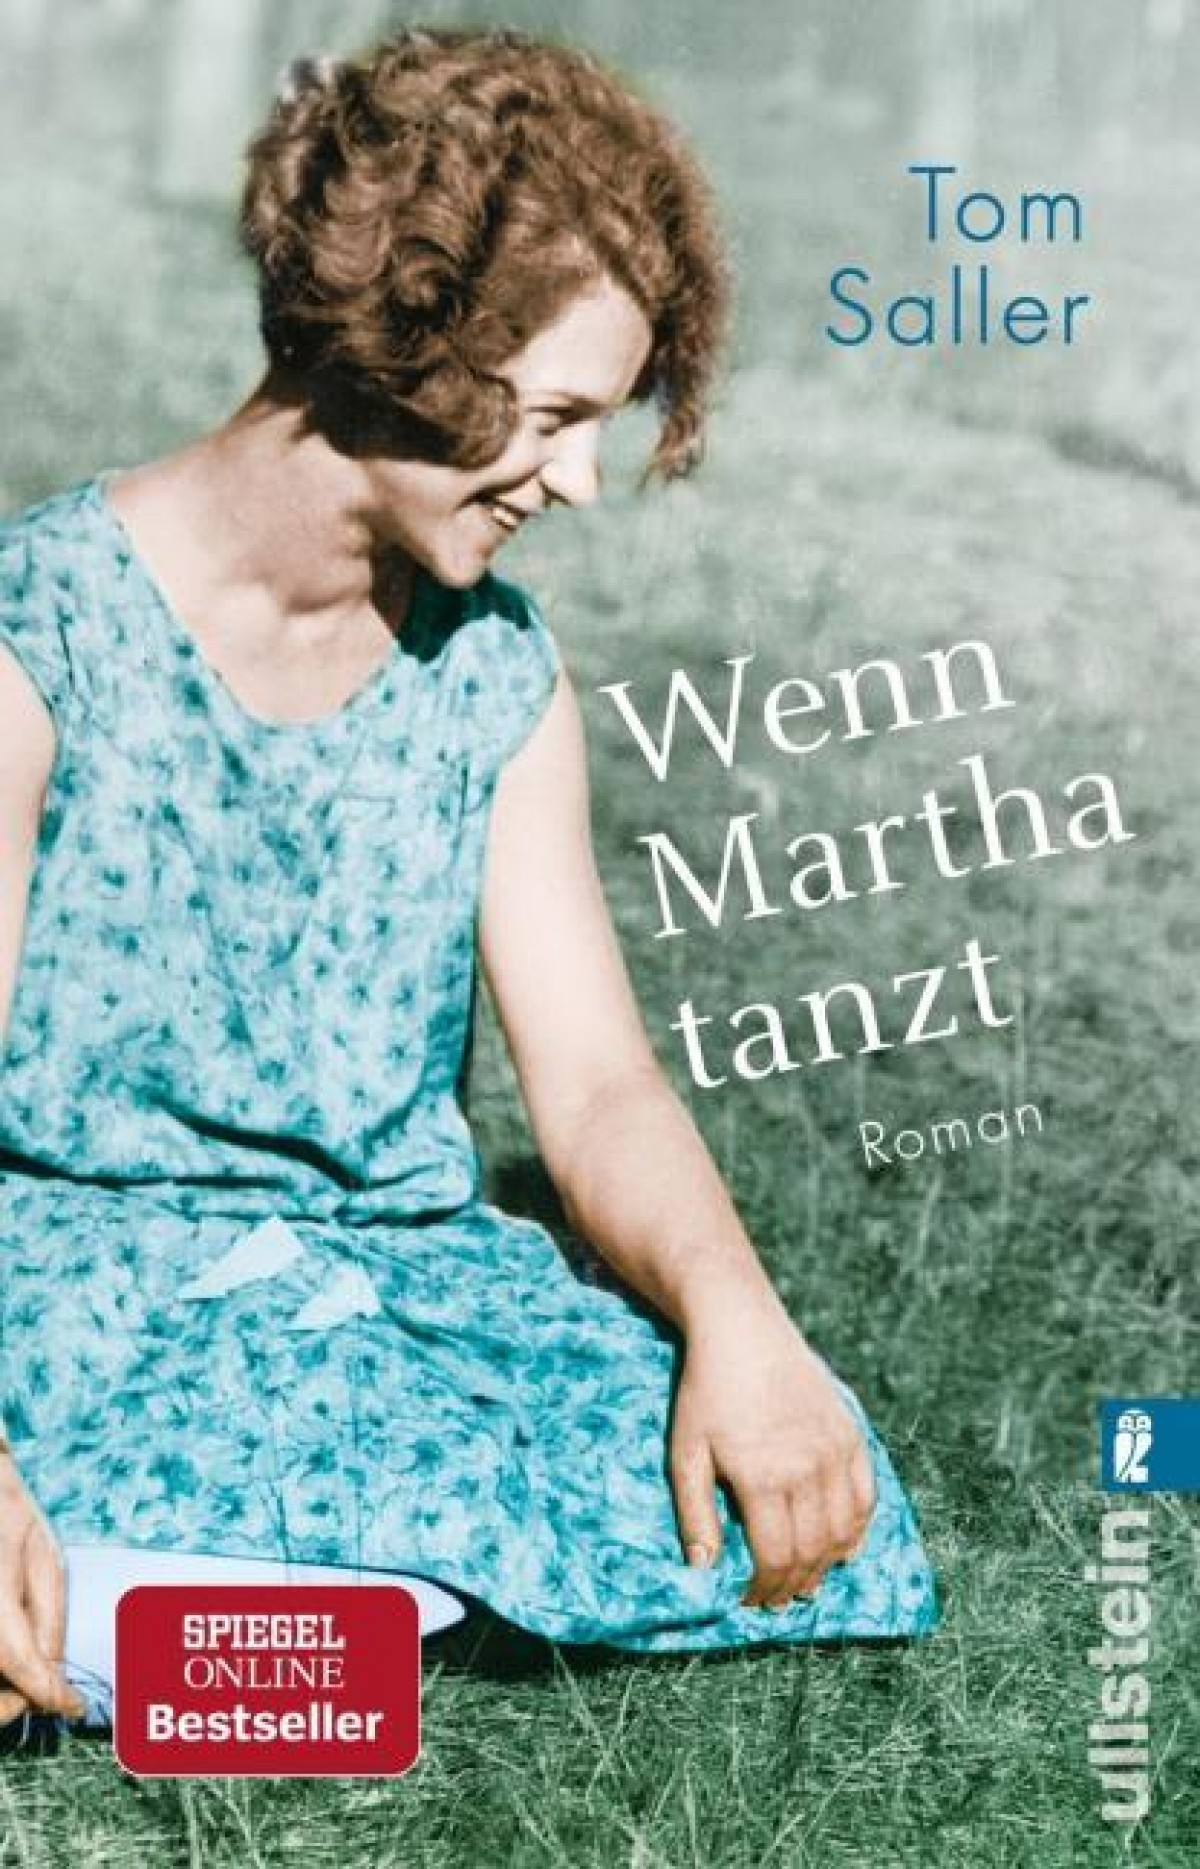 Buch Tom Saller, Wenn Martha tanzt